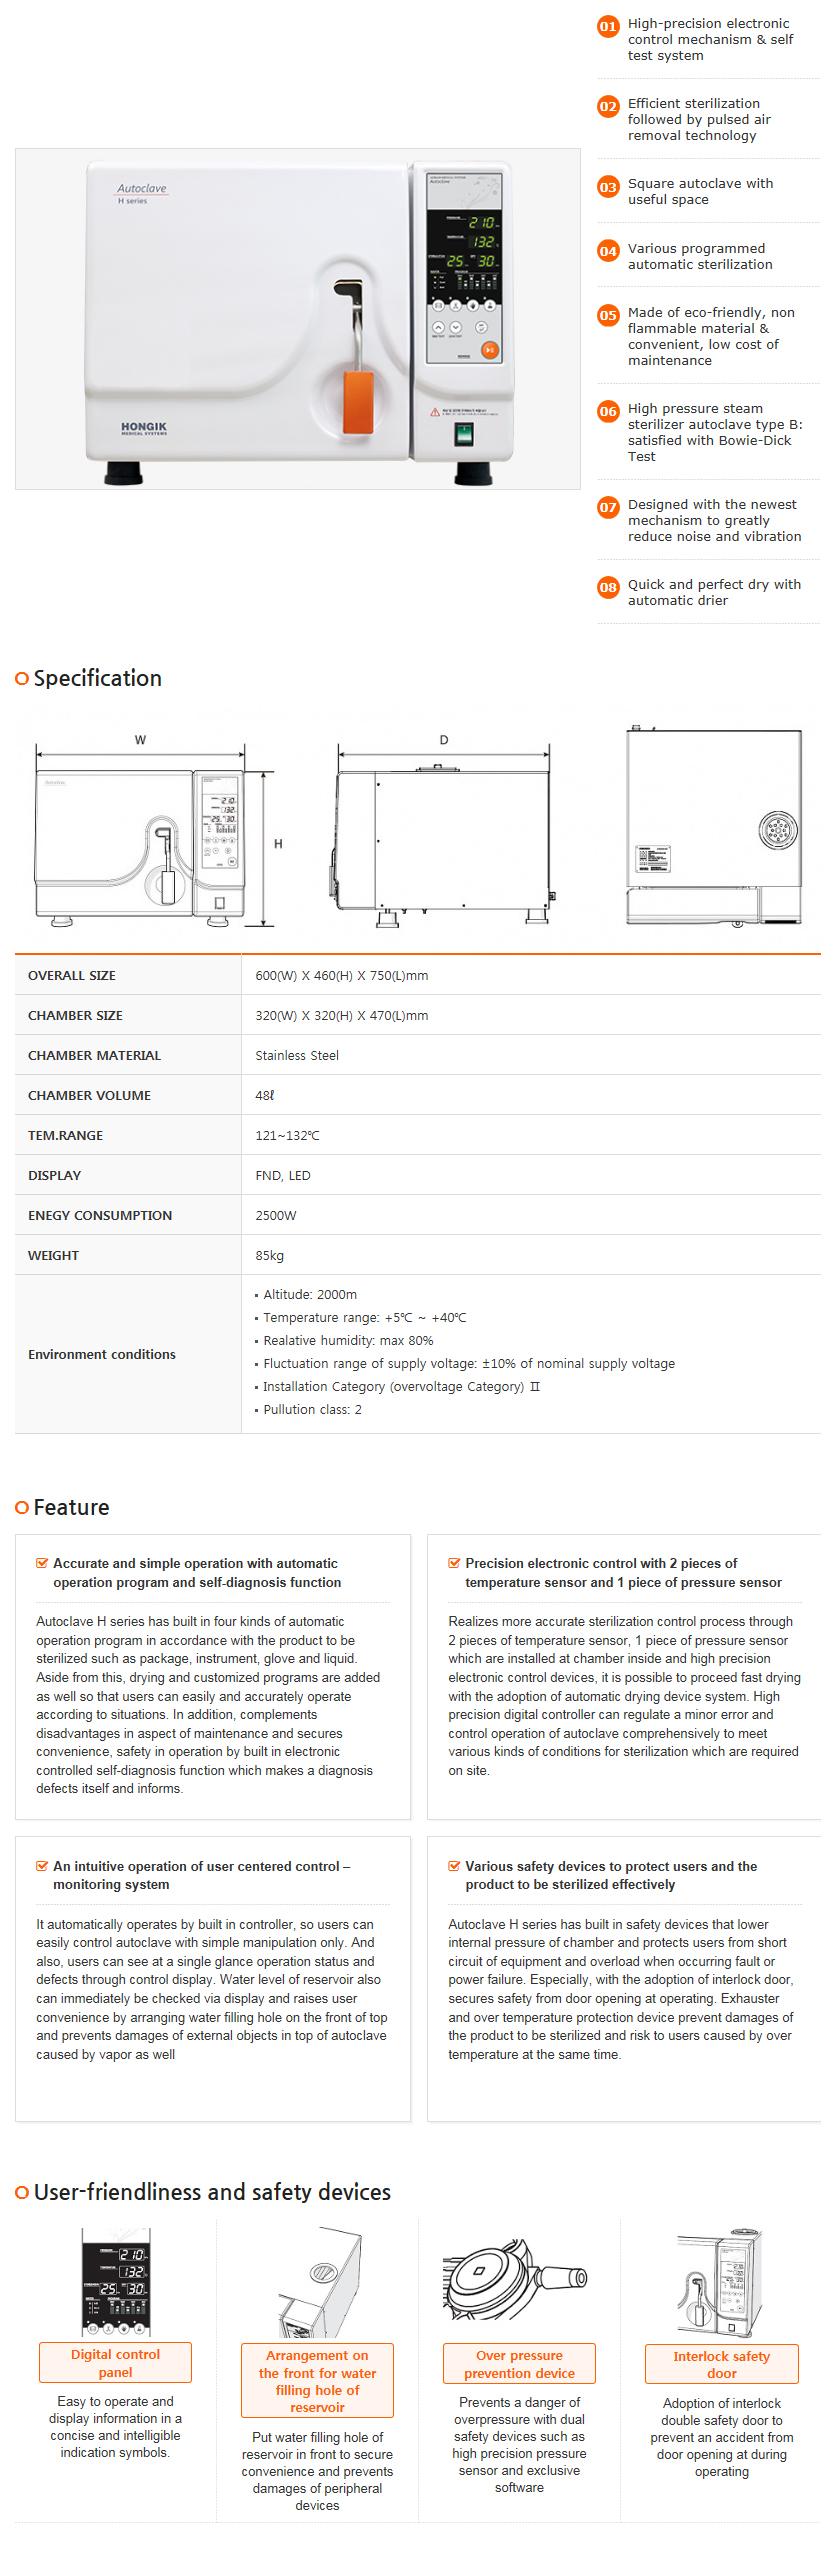 HONGIK MEDICAL SYSTEM Small-Scale Sterilizer H480V